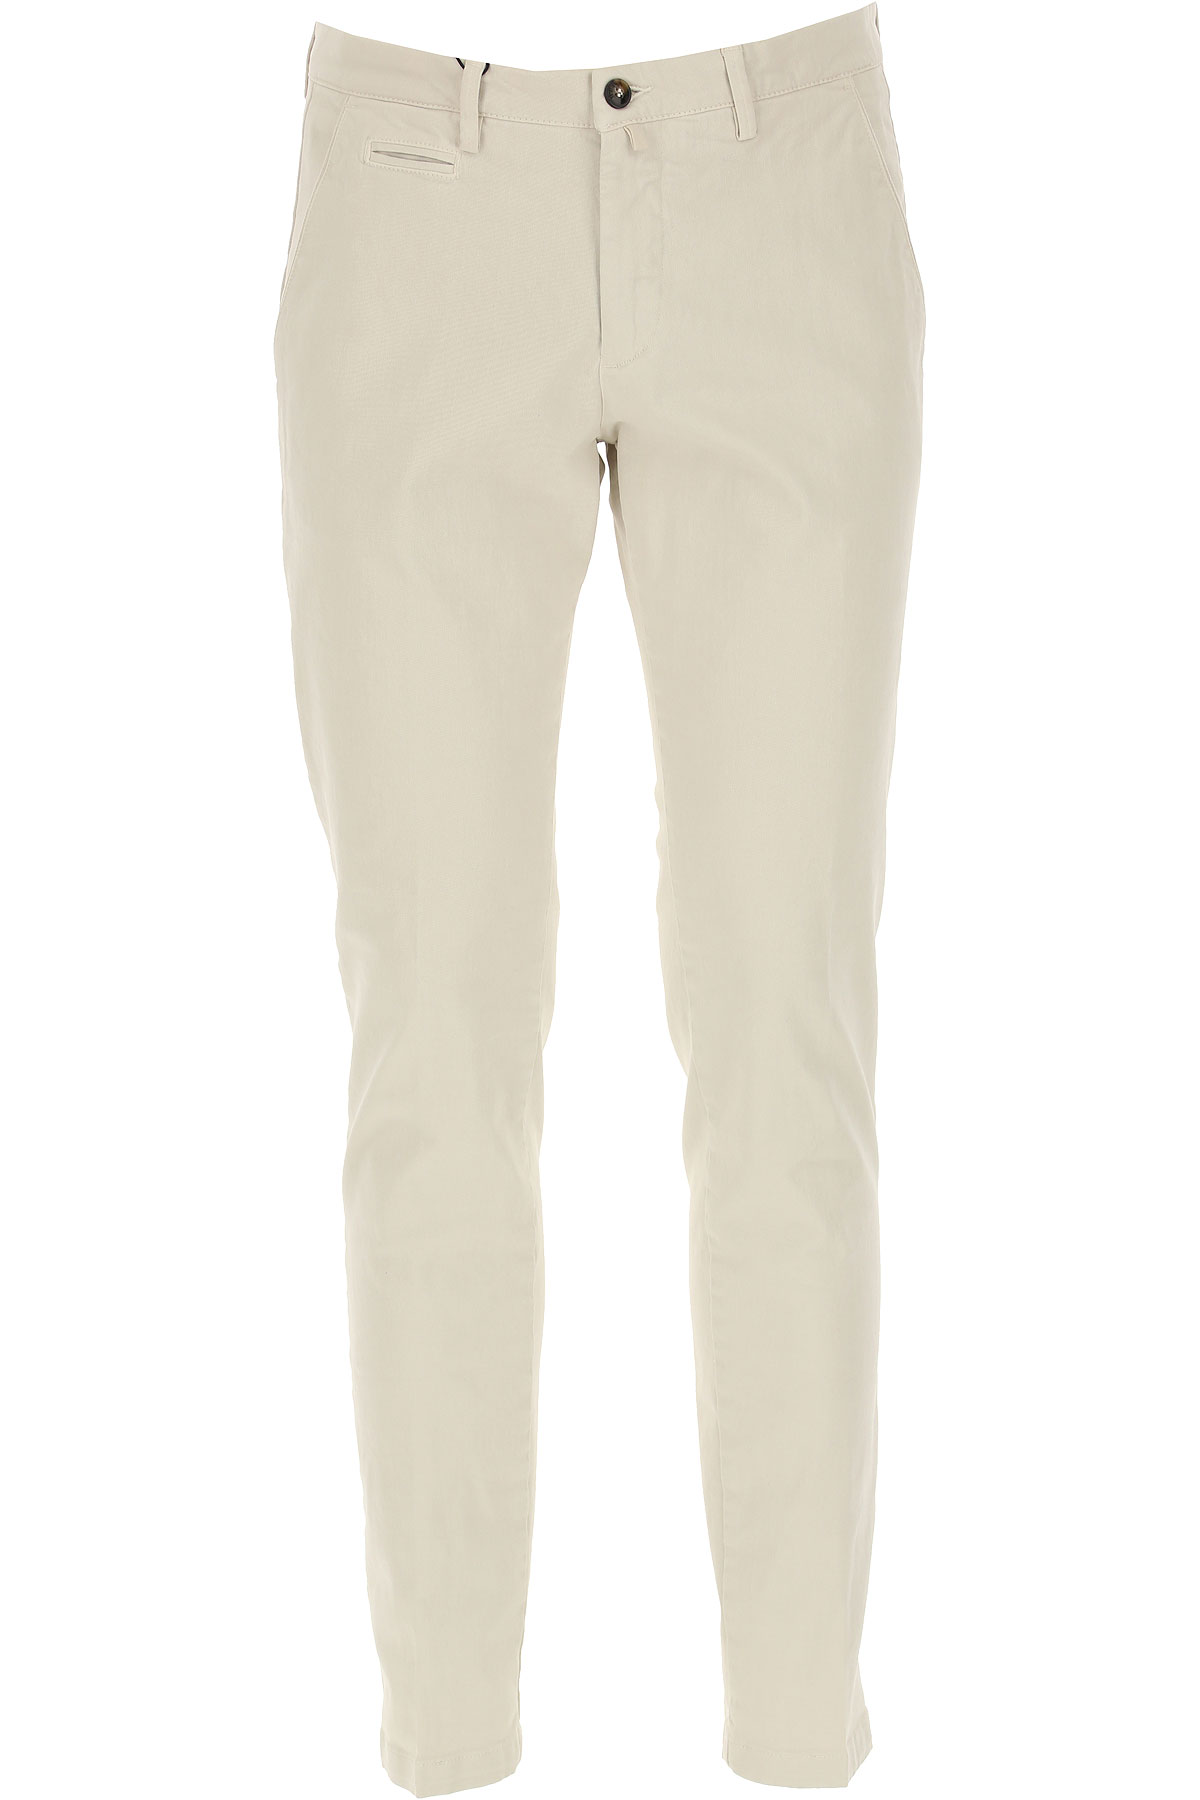 Briglia Pantalon Homme, Crème, Coton, 2019, 46 48